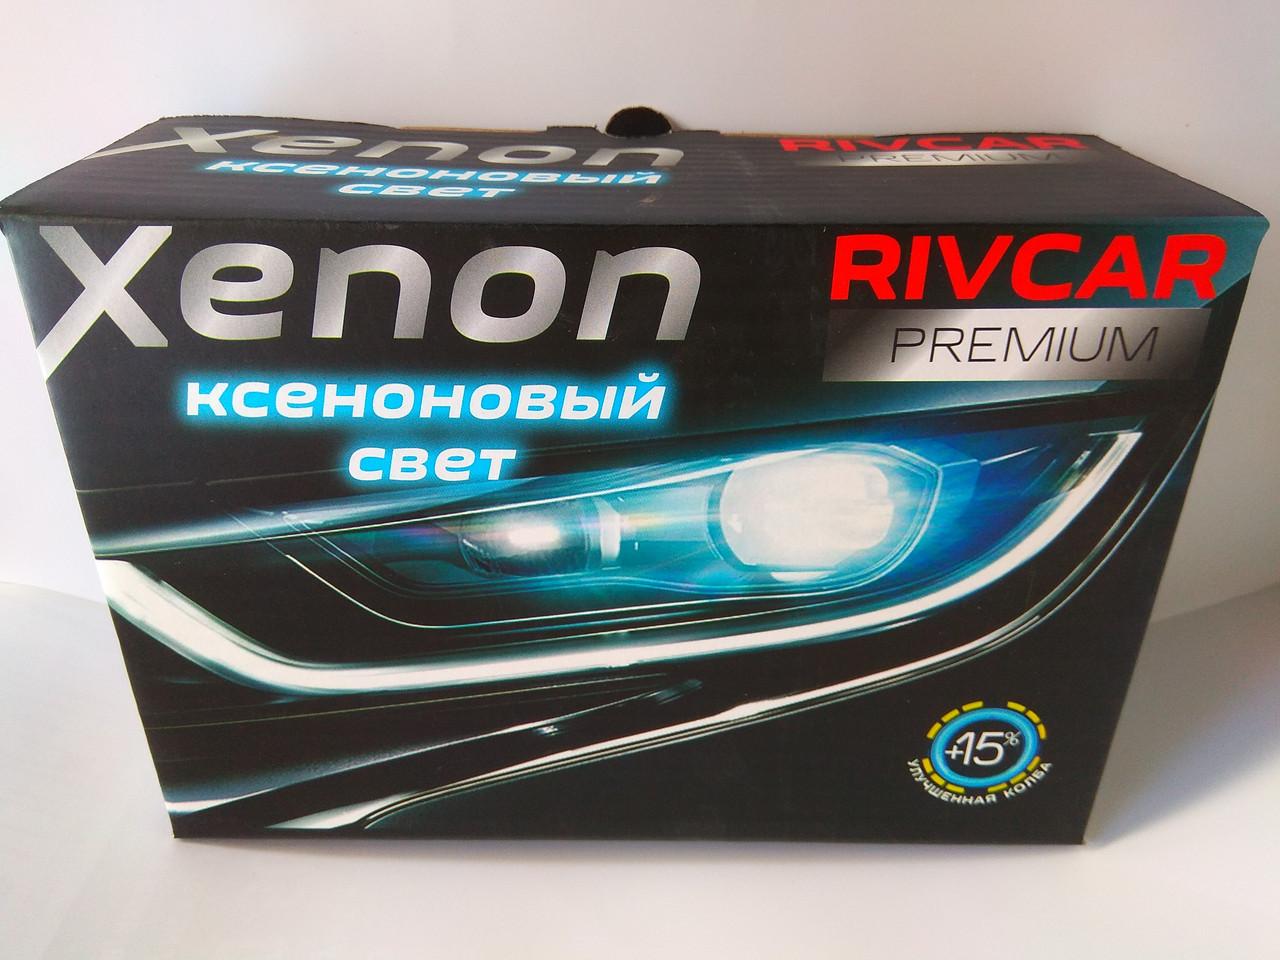 Ксенон Rivcar premium 24v HB3 6000k